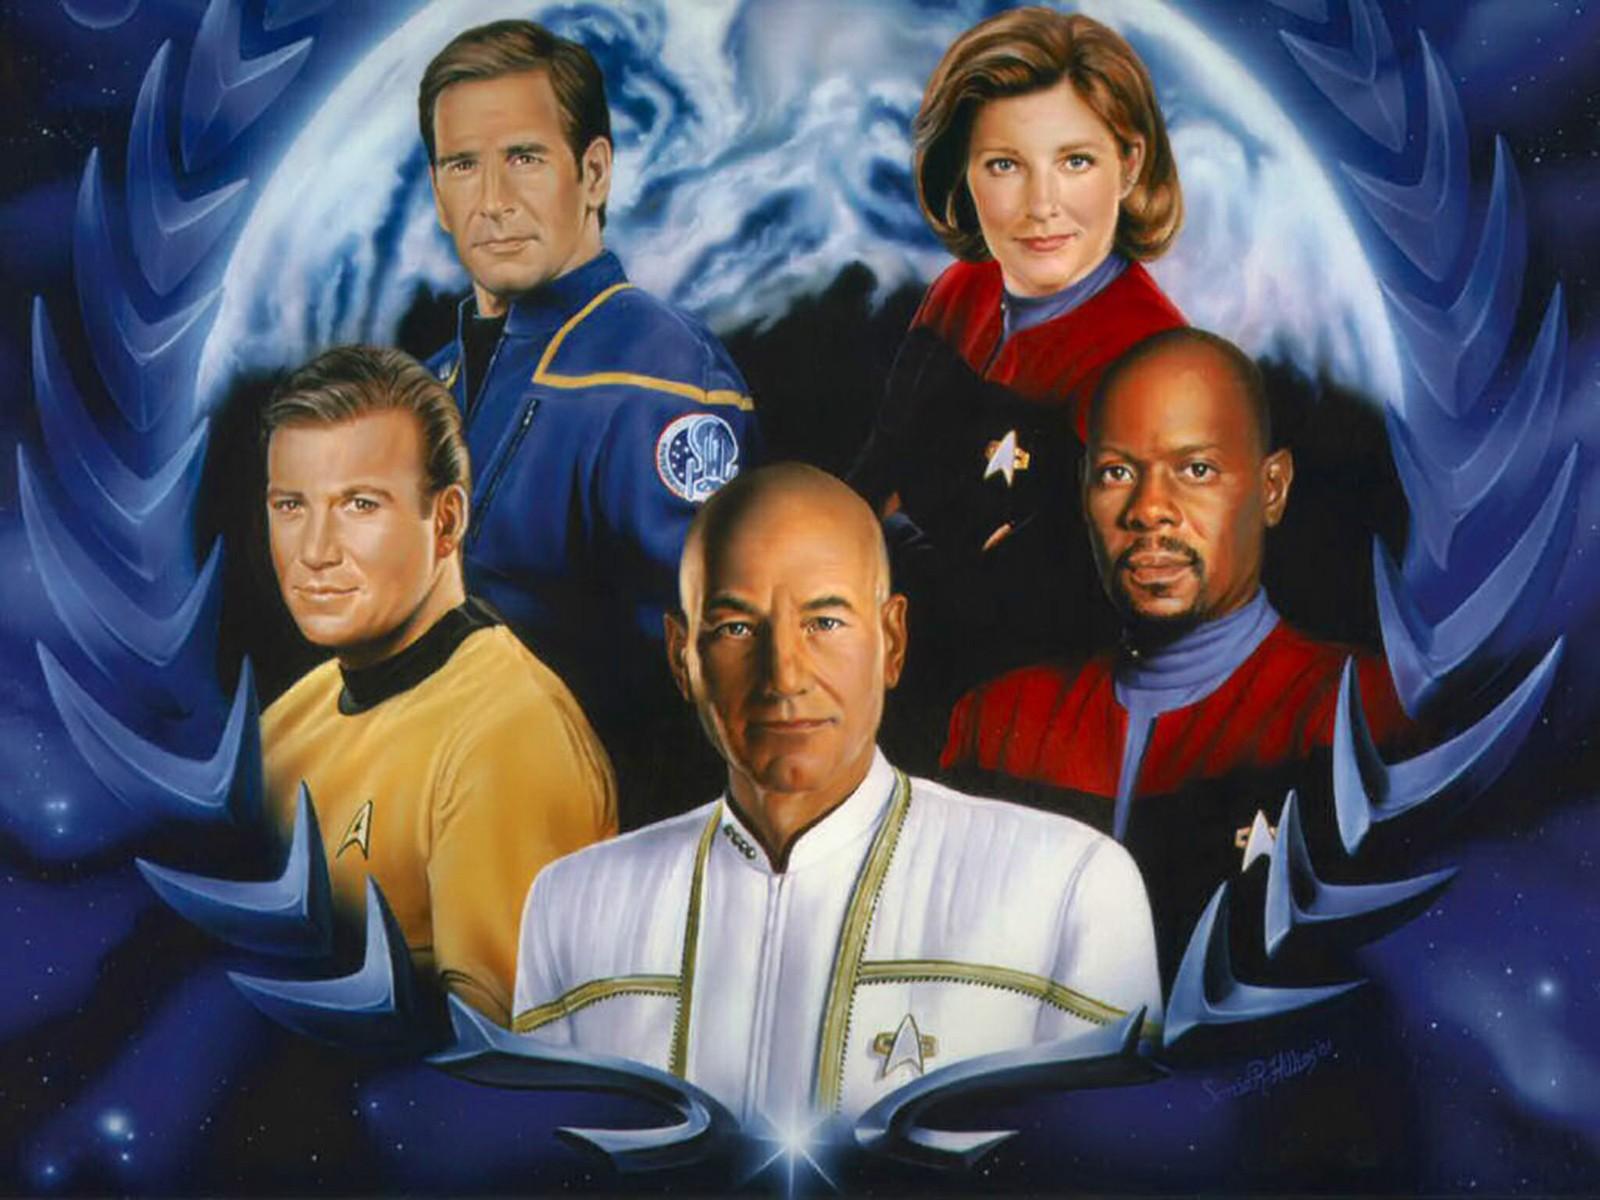 Star_Trek_Captains_Star_Trek_Universe_freecomputerdesktopwallpaper_1600